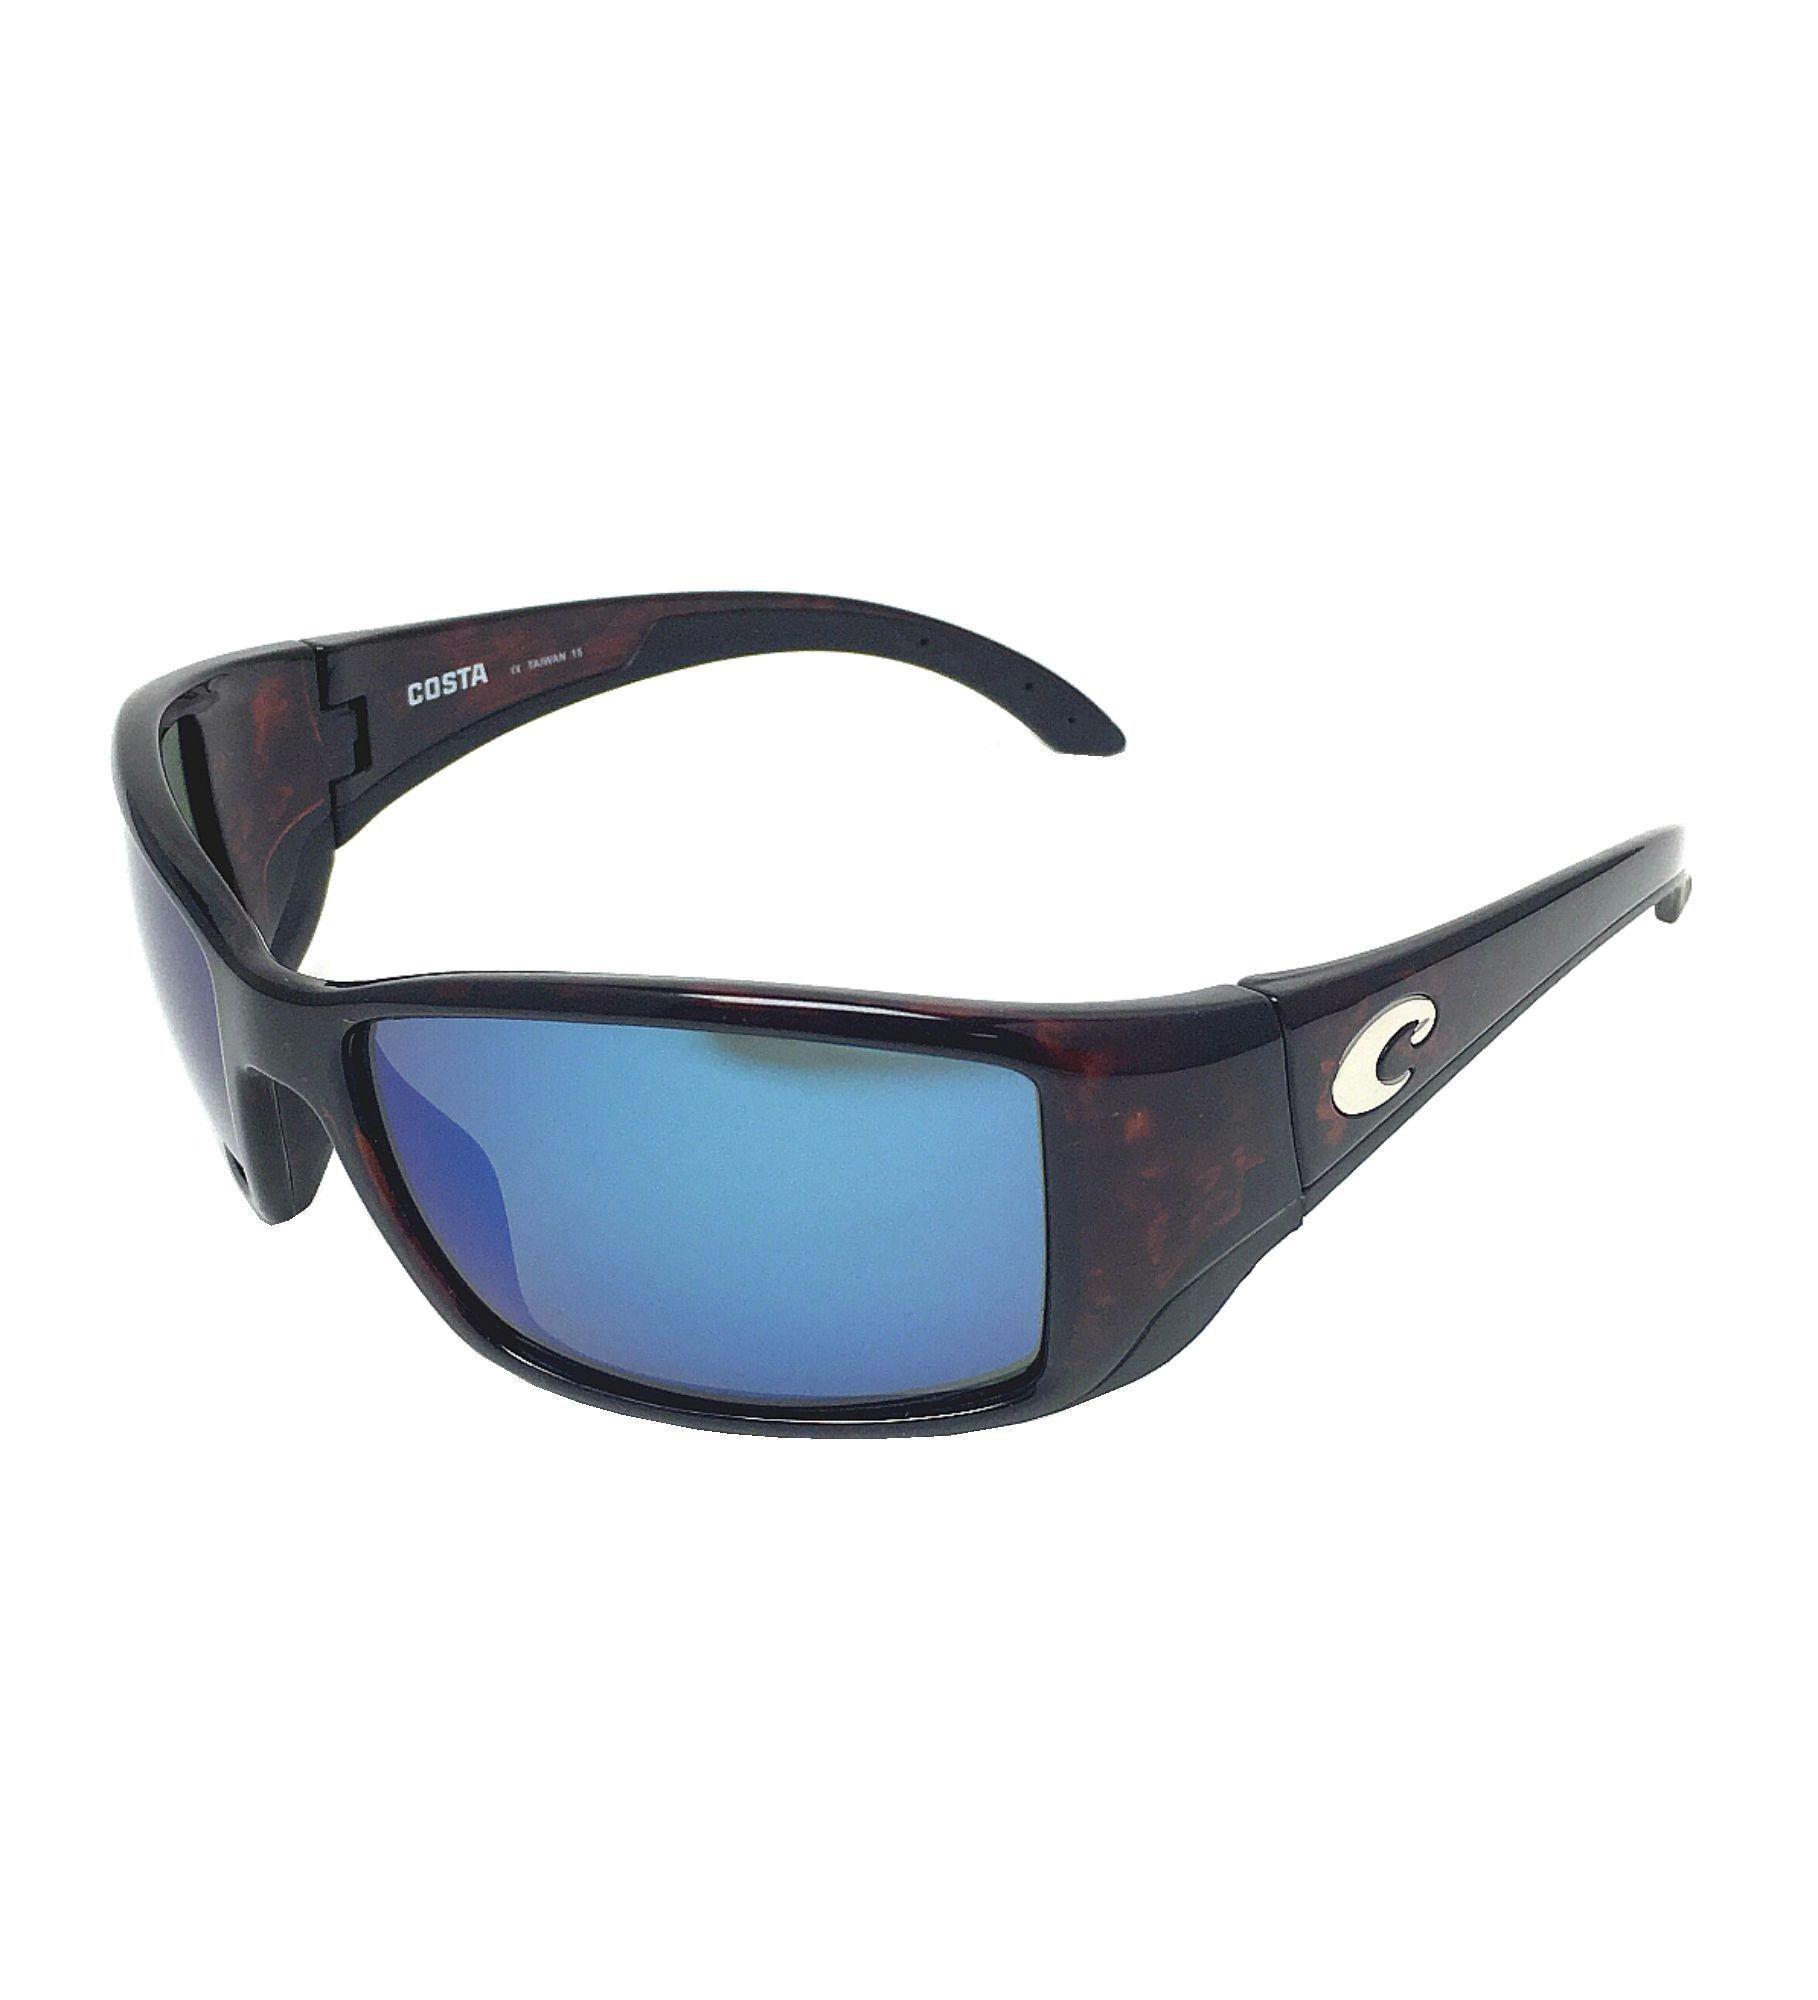 43a870d7d5 Costa Del Mar Blackfin 580G Tortoise Blue Mirror Polarized Sunglasses